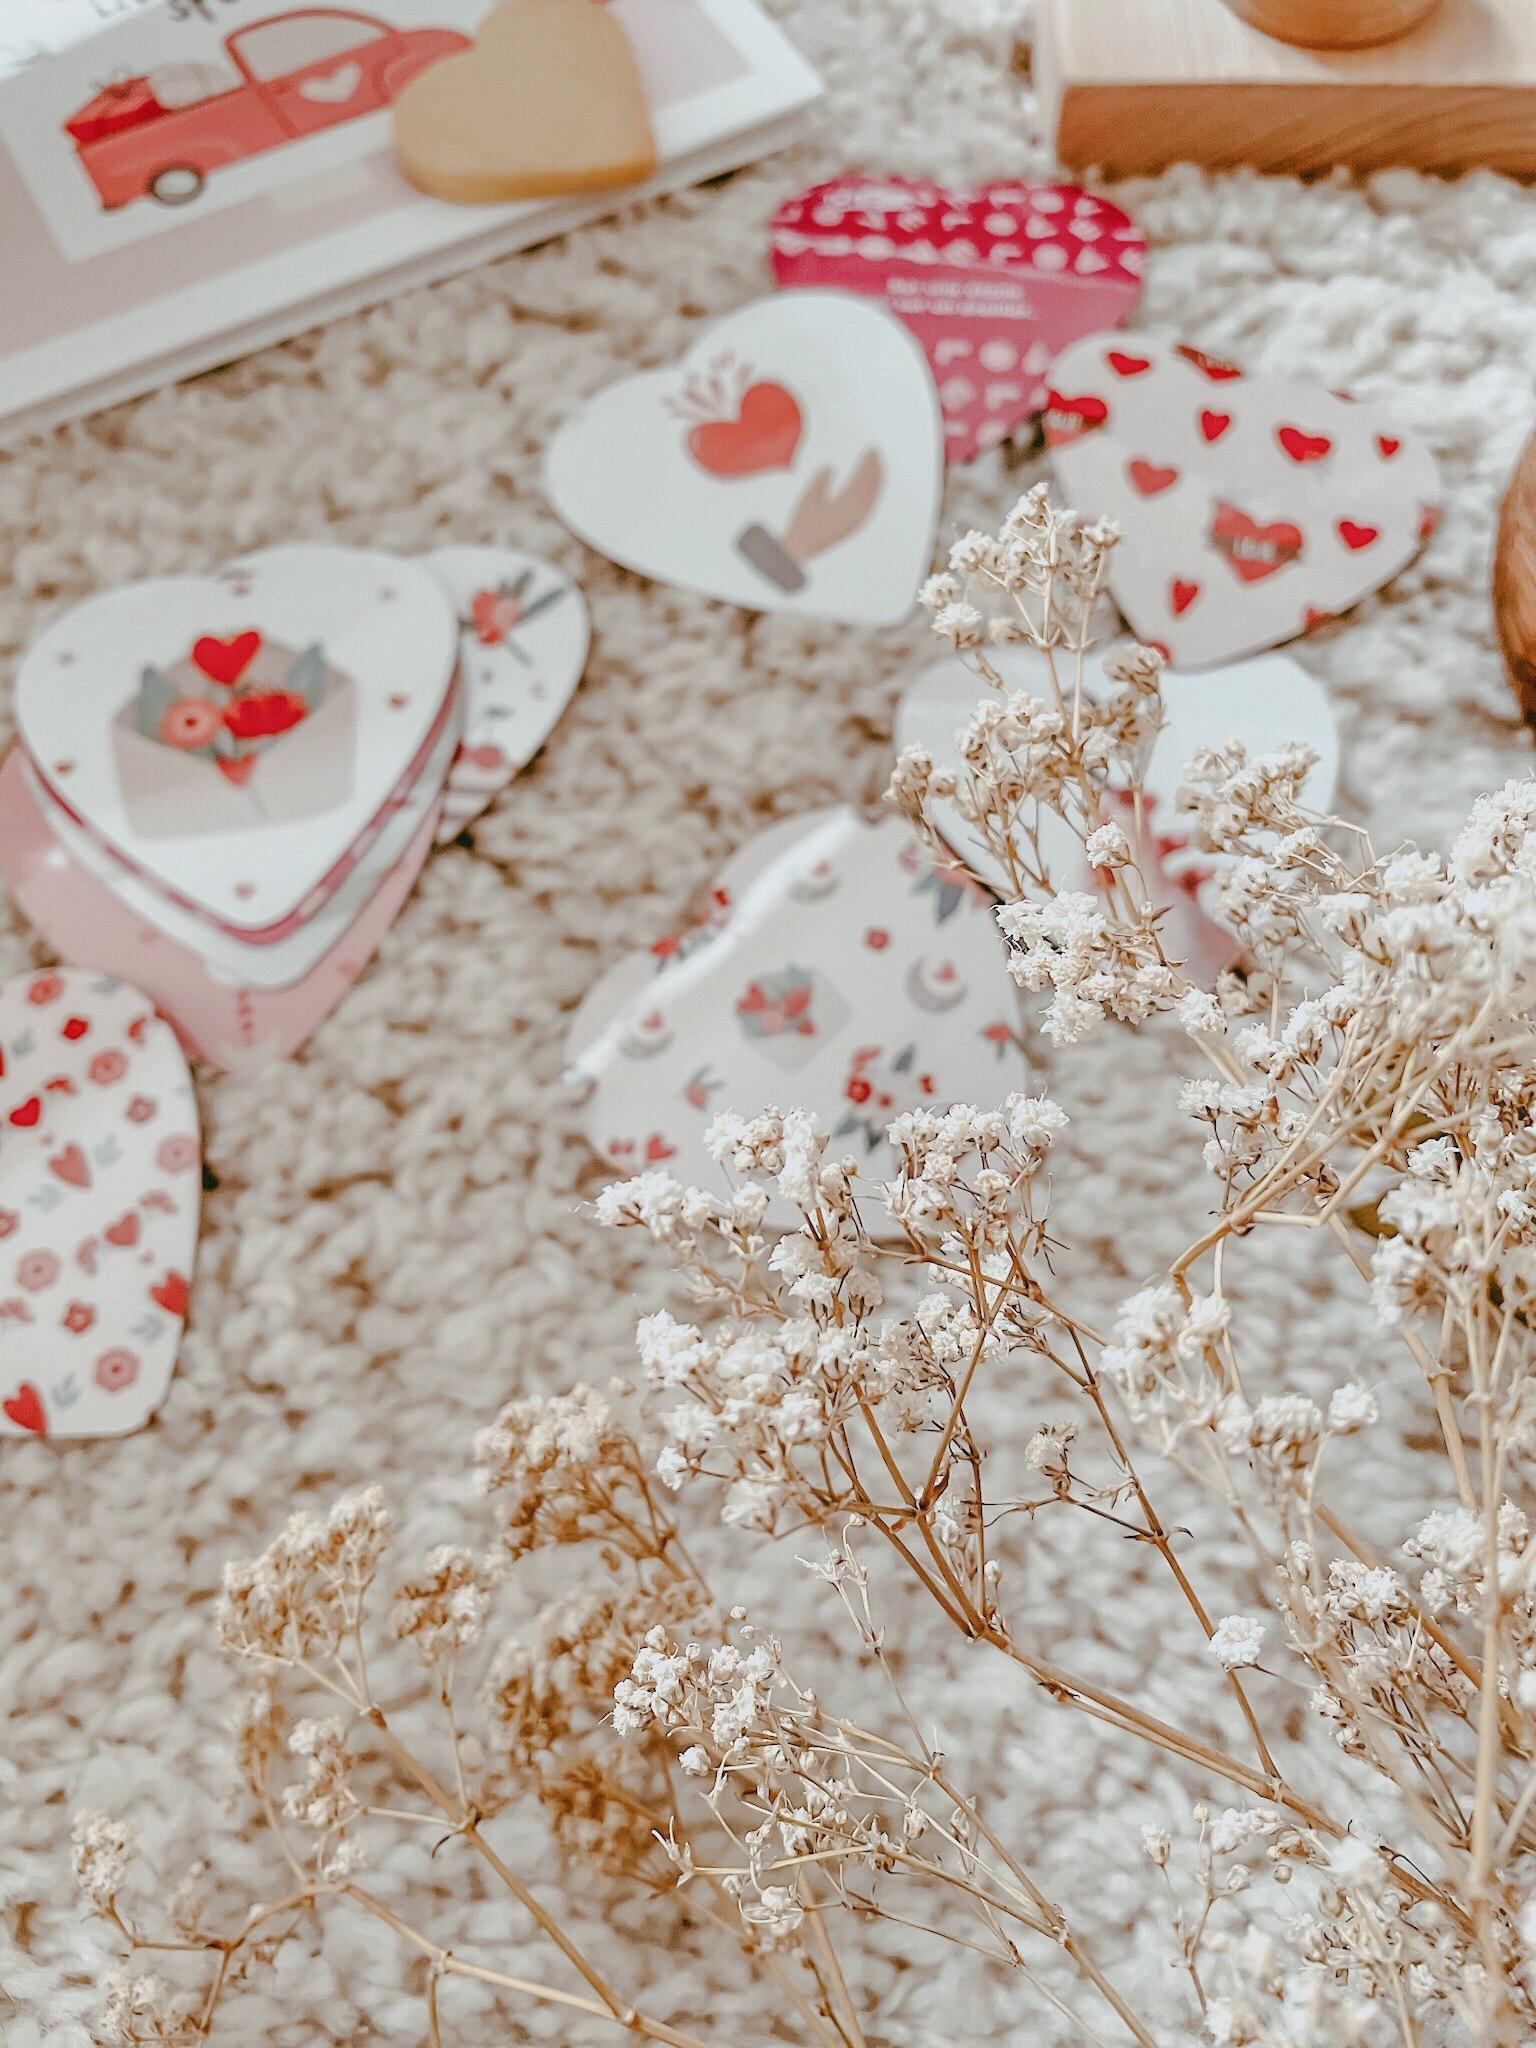 cheerz x mathilde cabanas st valentin idee cadeau 10